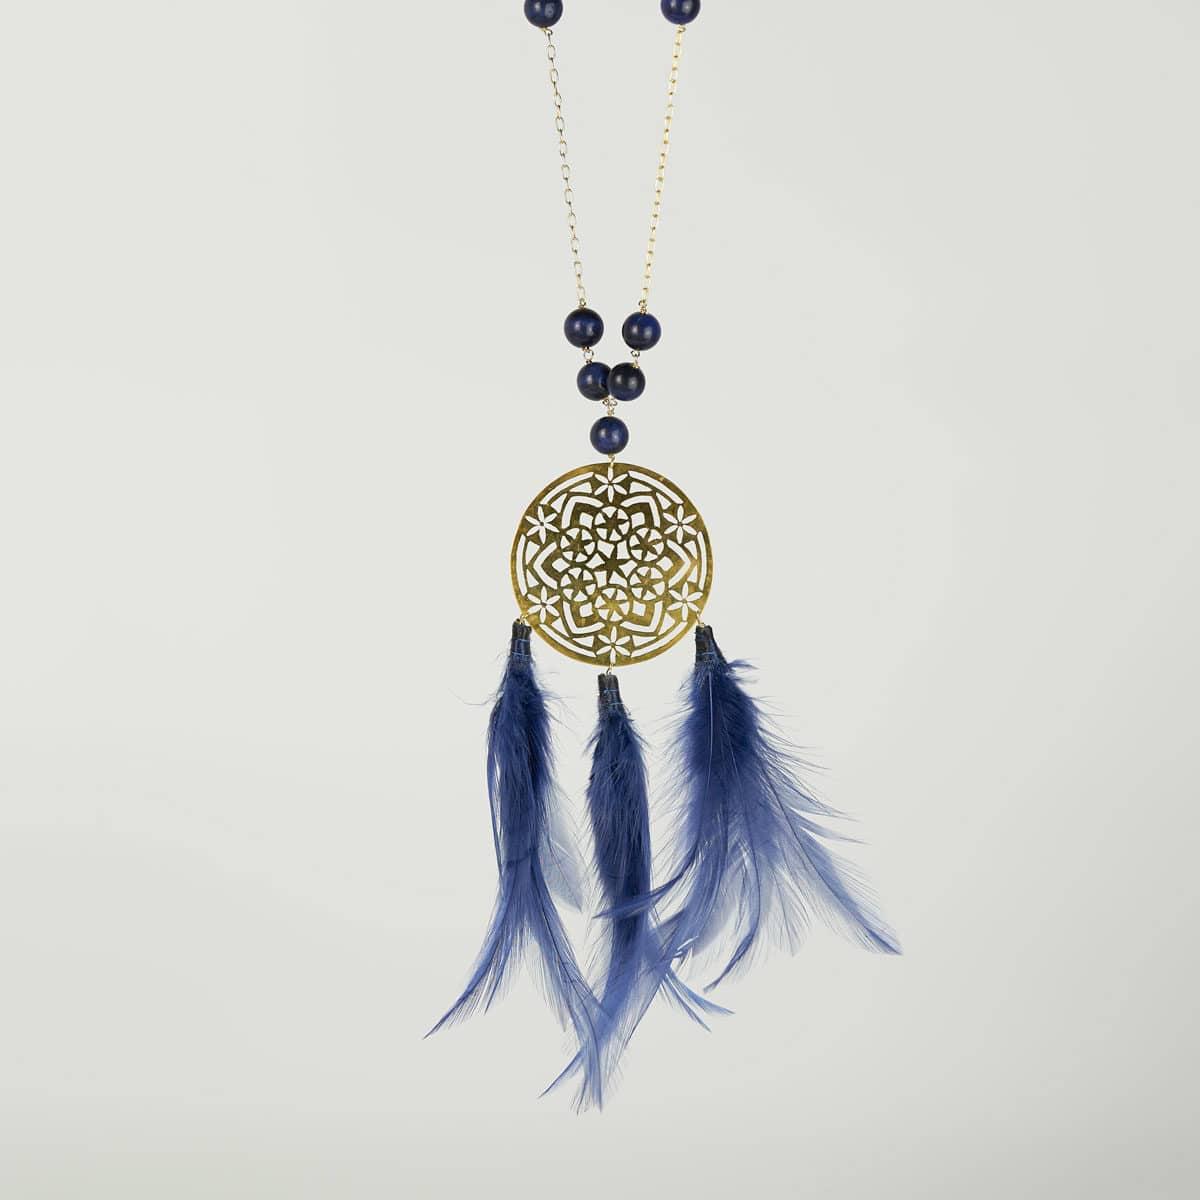 Collar de diseño modelo Atrapasueños. diseño en plata con baño de oro. Joyas Siliva.